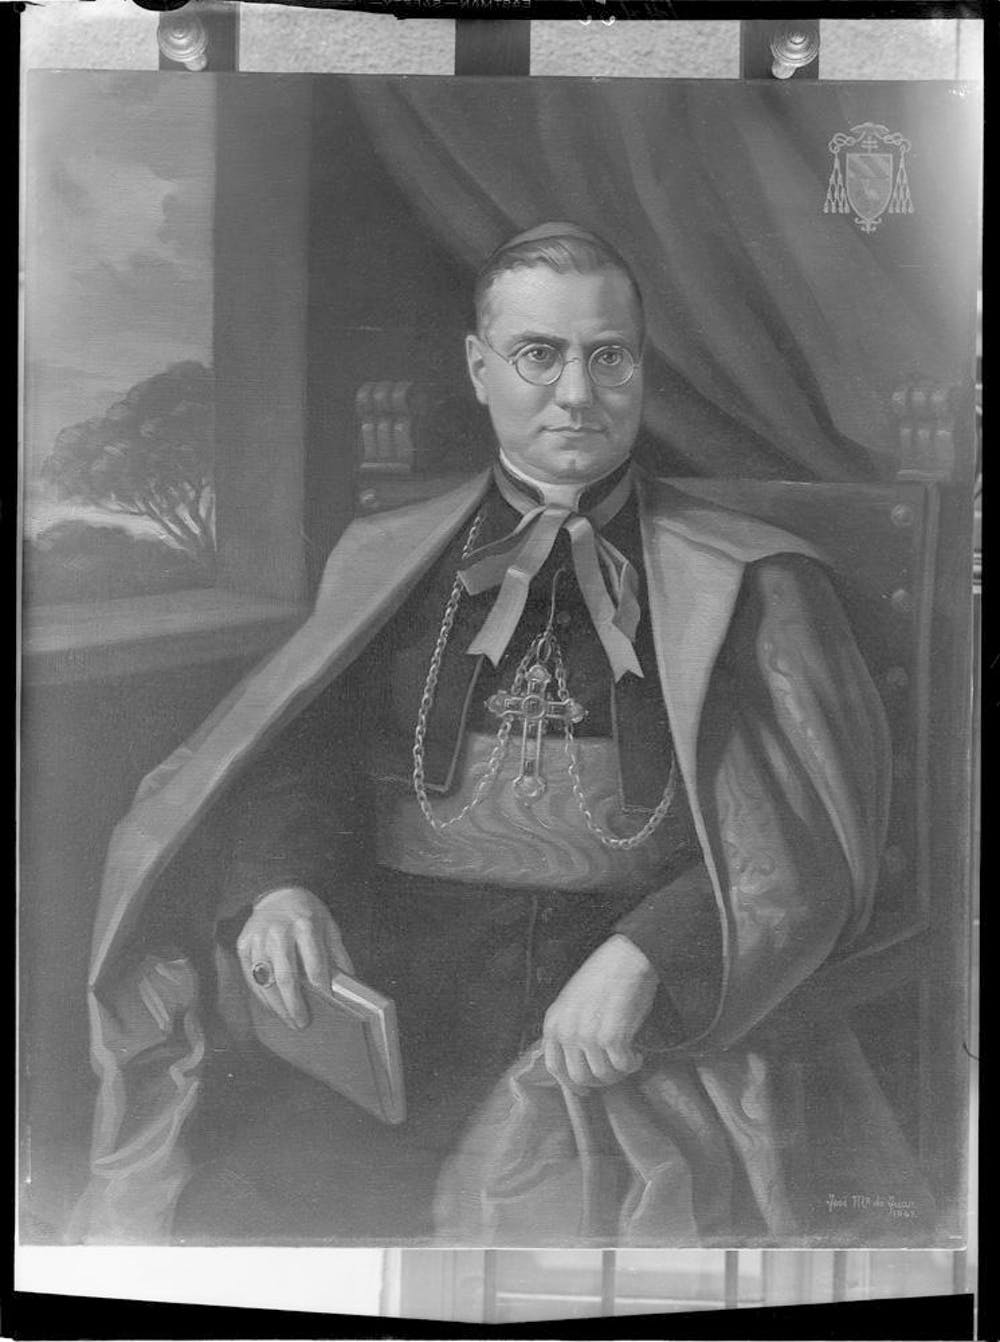 Retrato de Monseñor Cicogniani (1942). Ruiz Vernacci / Fototeca del Patrimonio Histórico, CC BY-NC